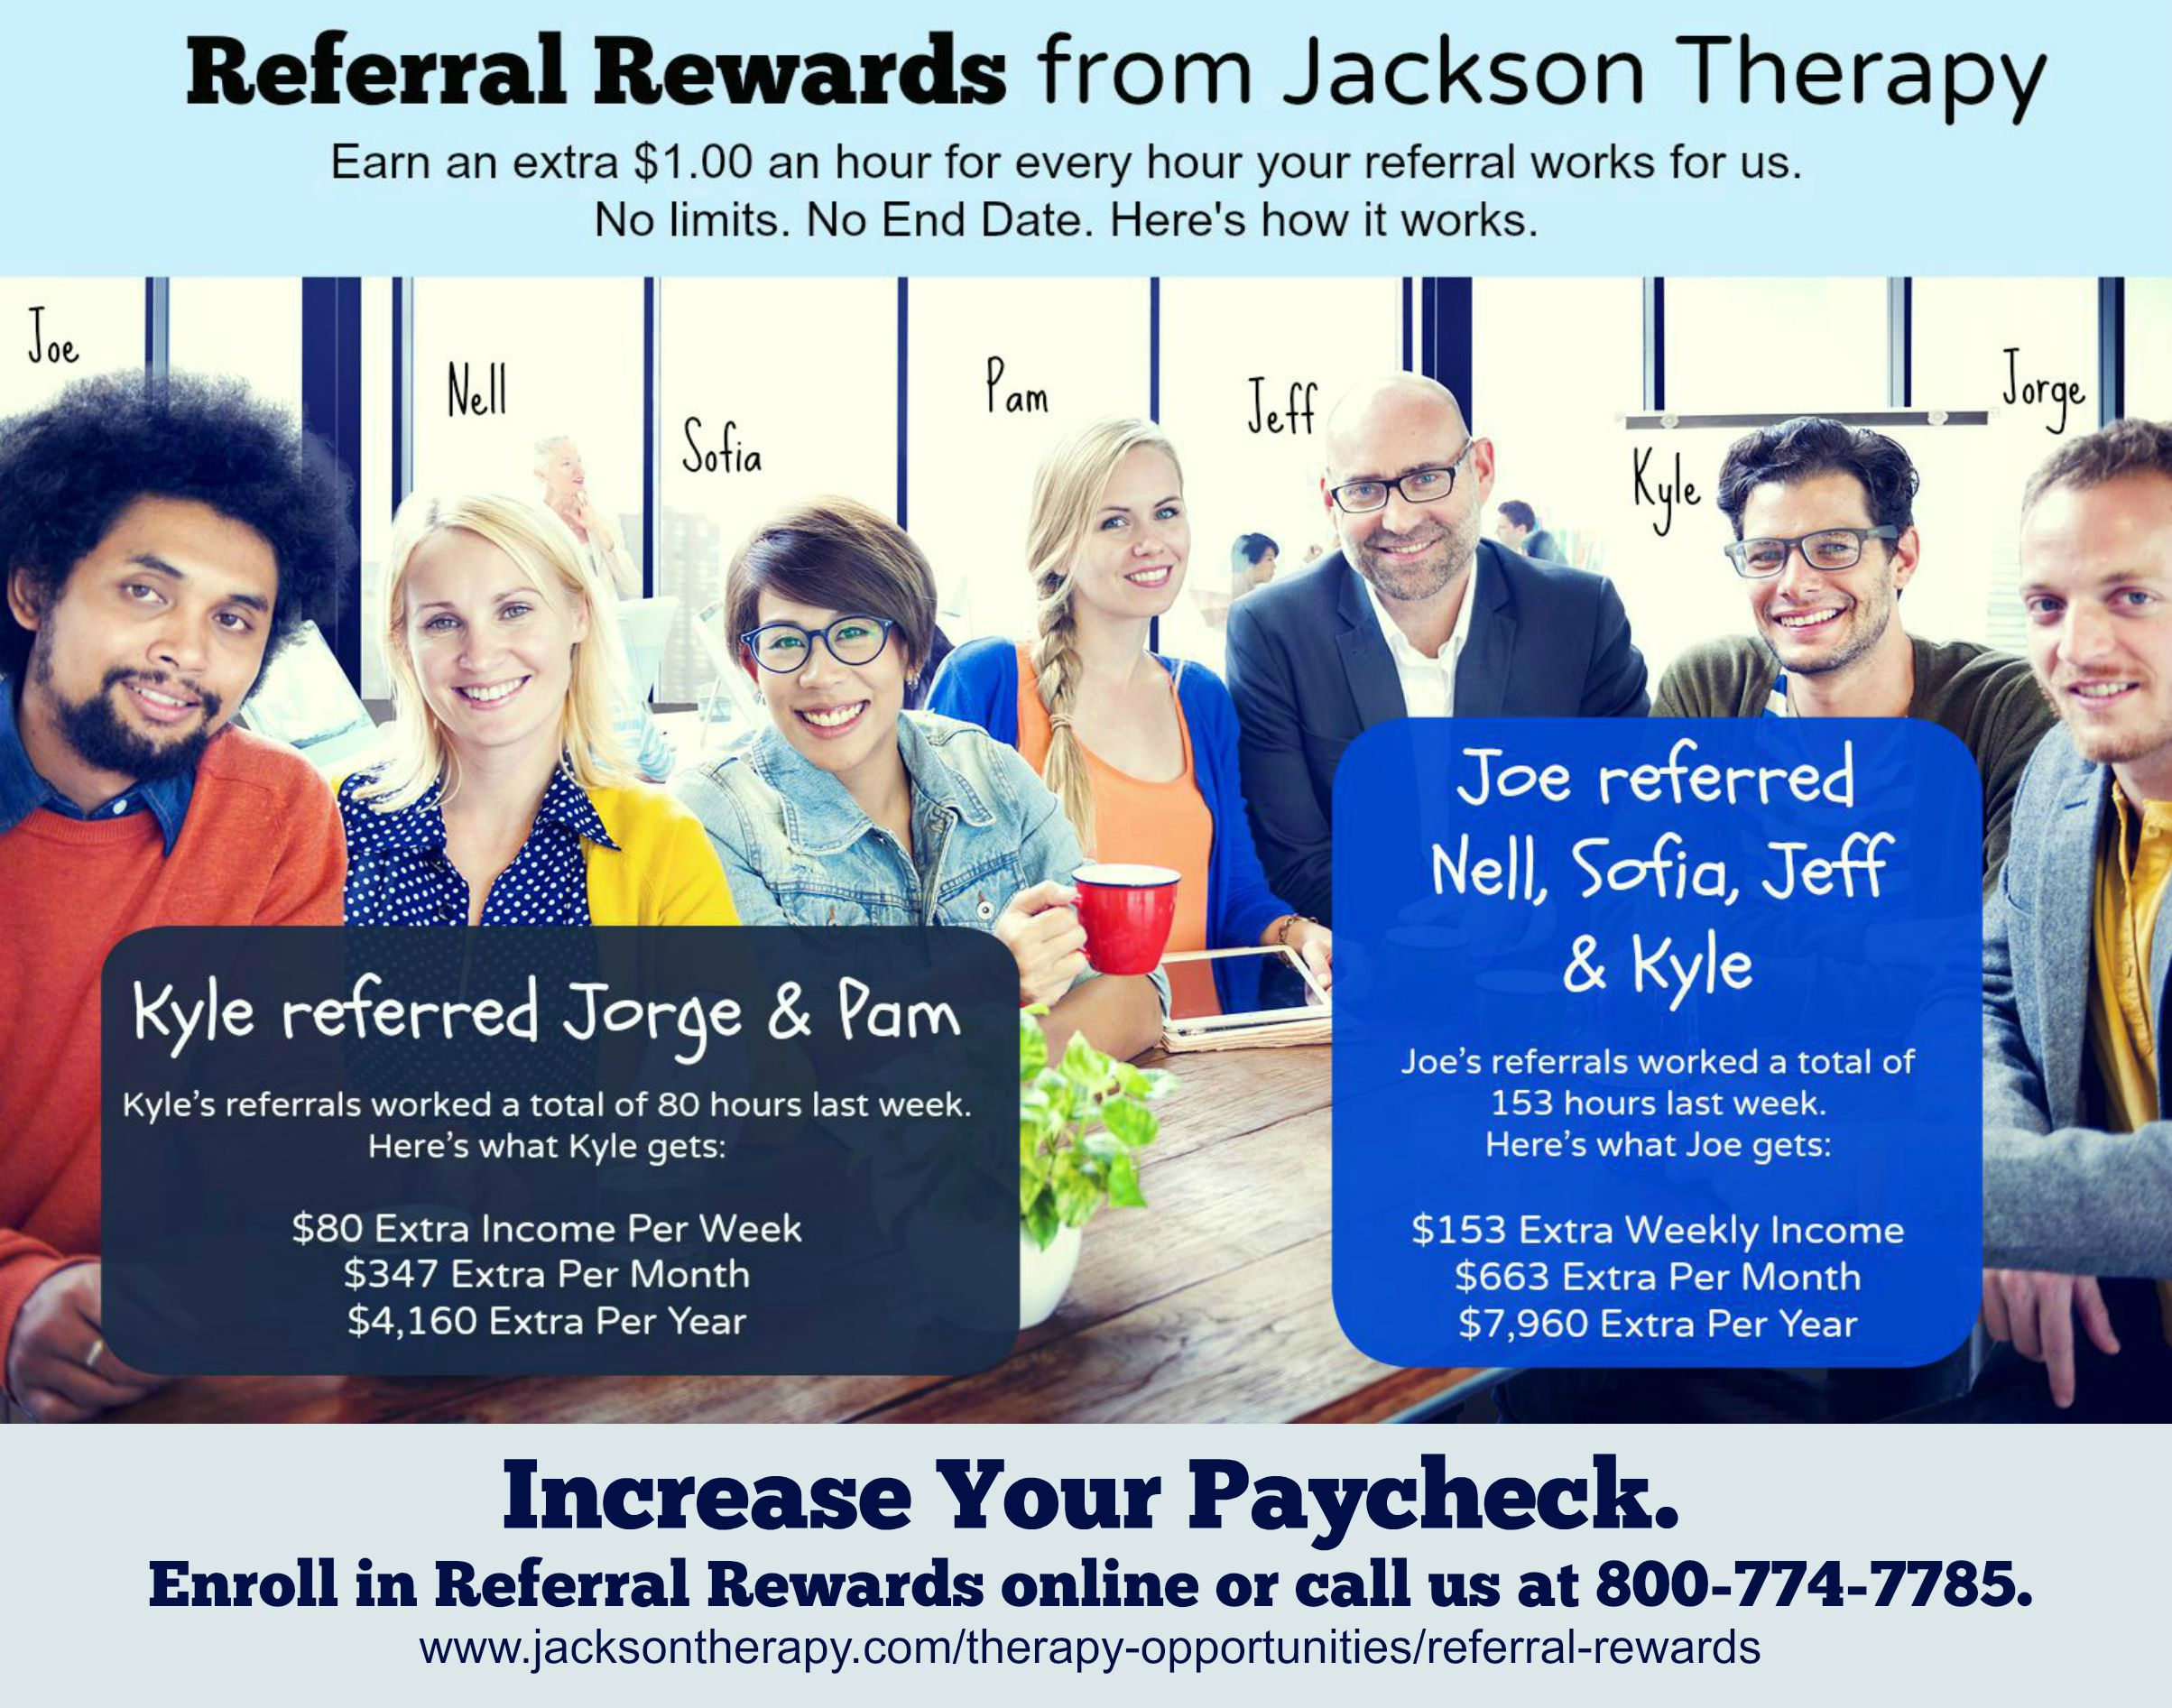 Referral_Rewards_Jackson